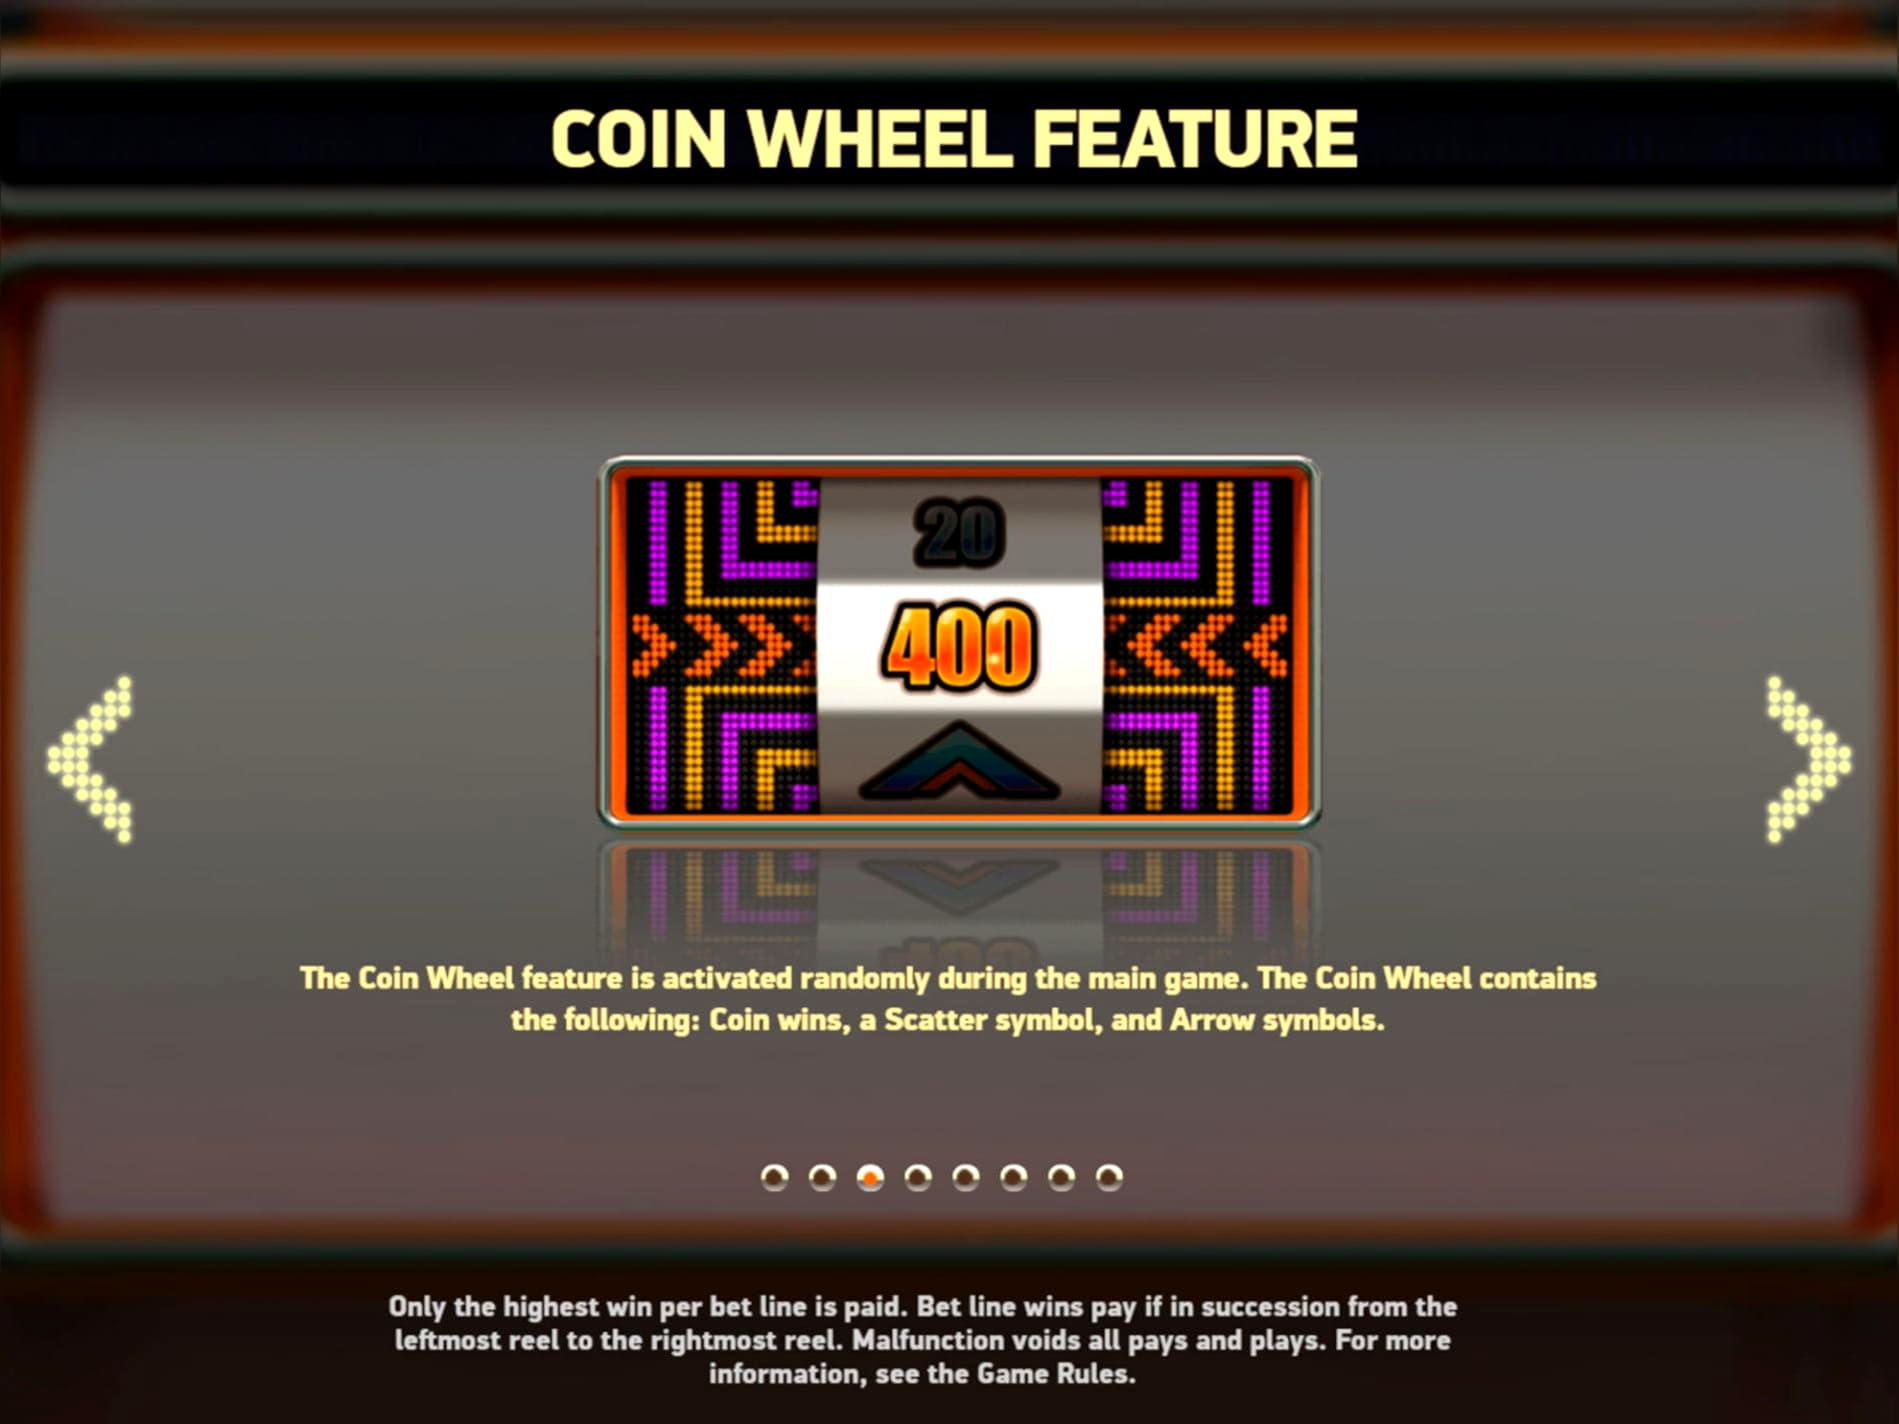 Eur 380 Mobile freeroll slot tournament at William Hill Casino